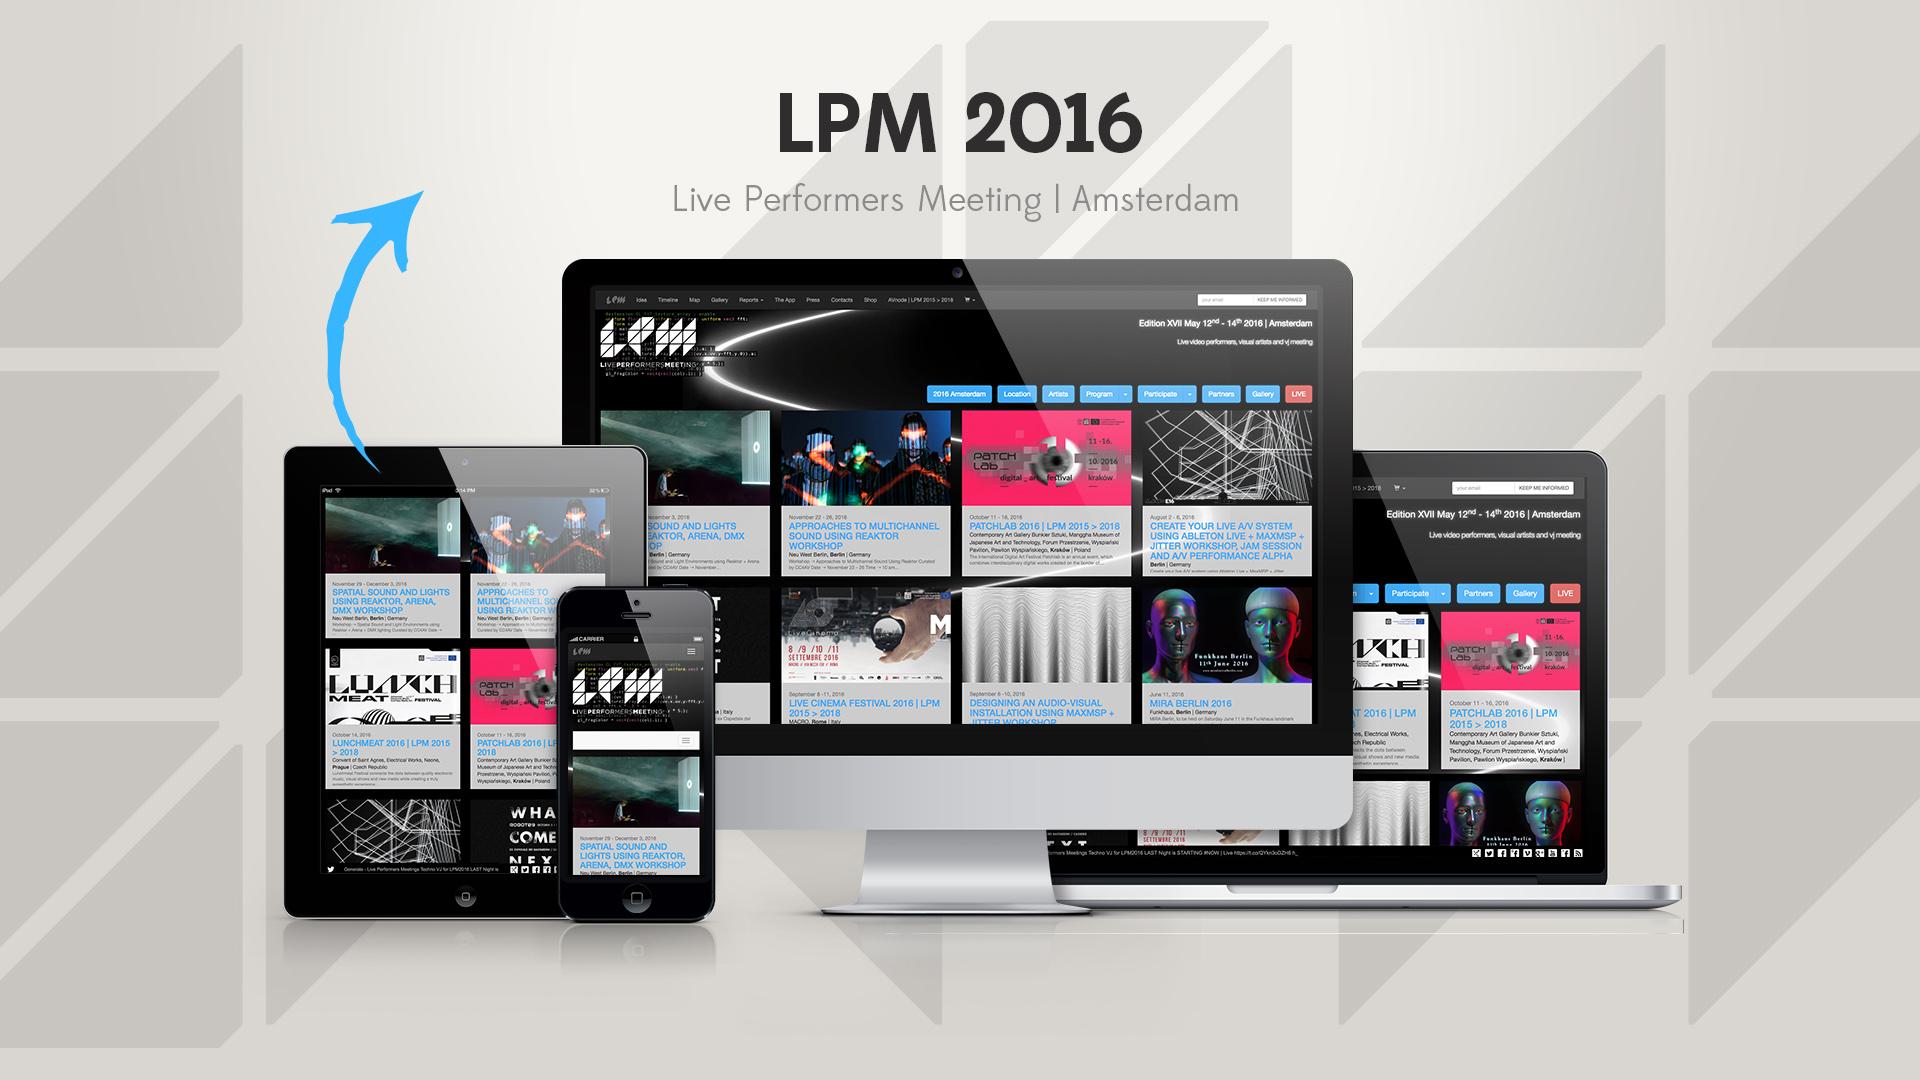 LPM 2016 Amsterdam – Web Site